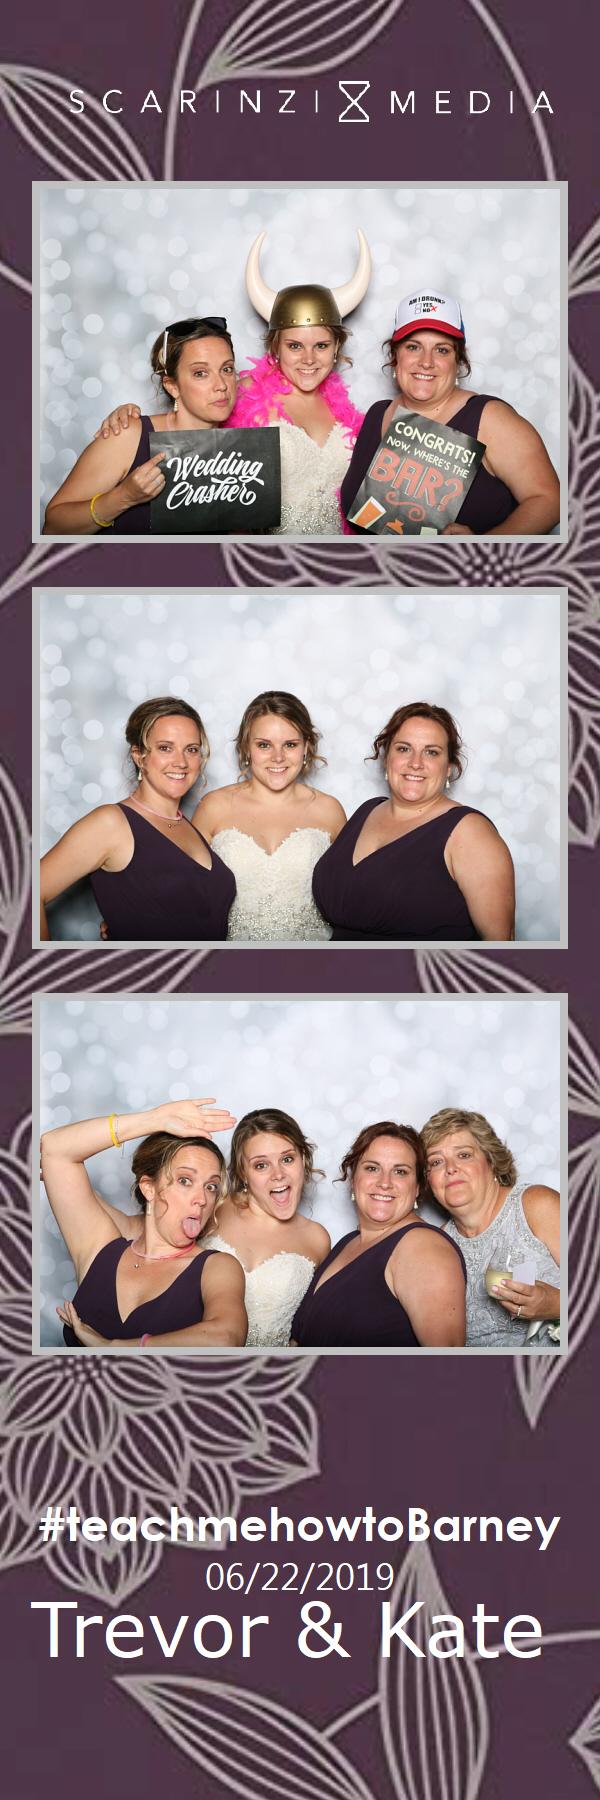 2019.06.22 - Barney Wedding PHOTOBOOTH66.jpg